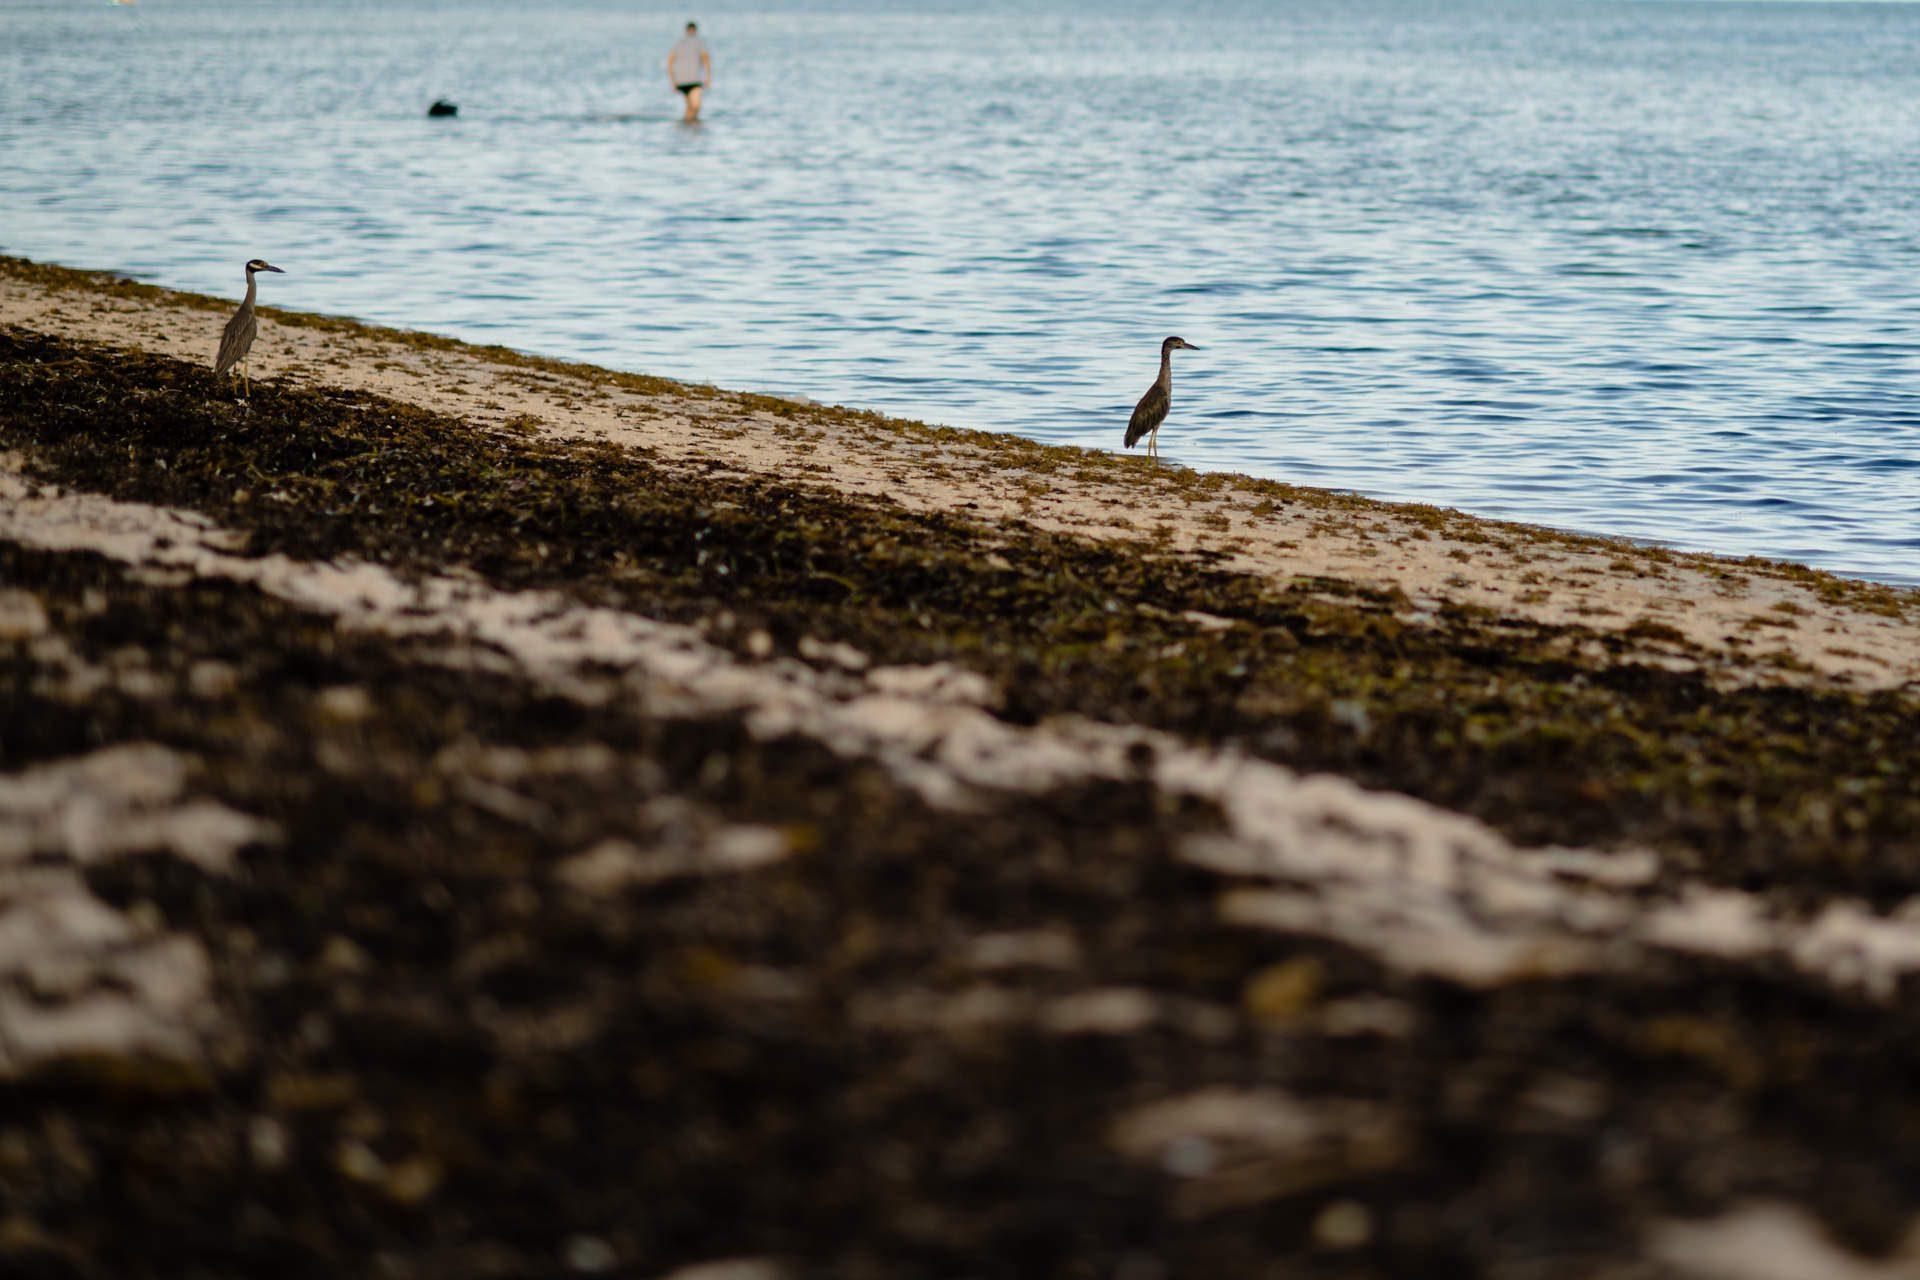 Pelican at the beach.